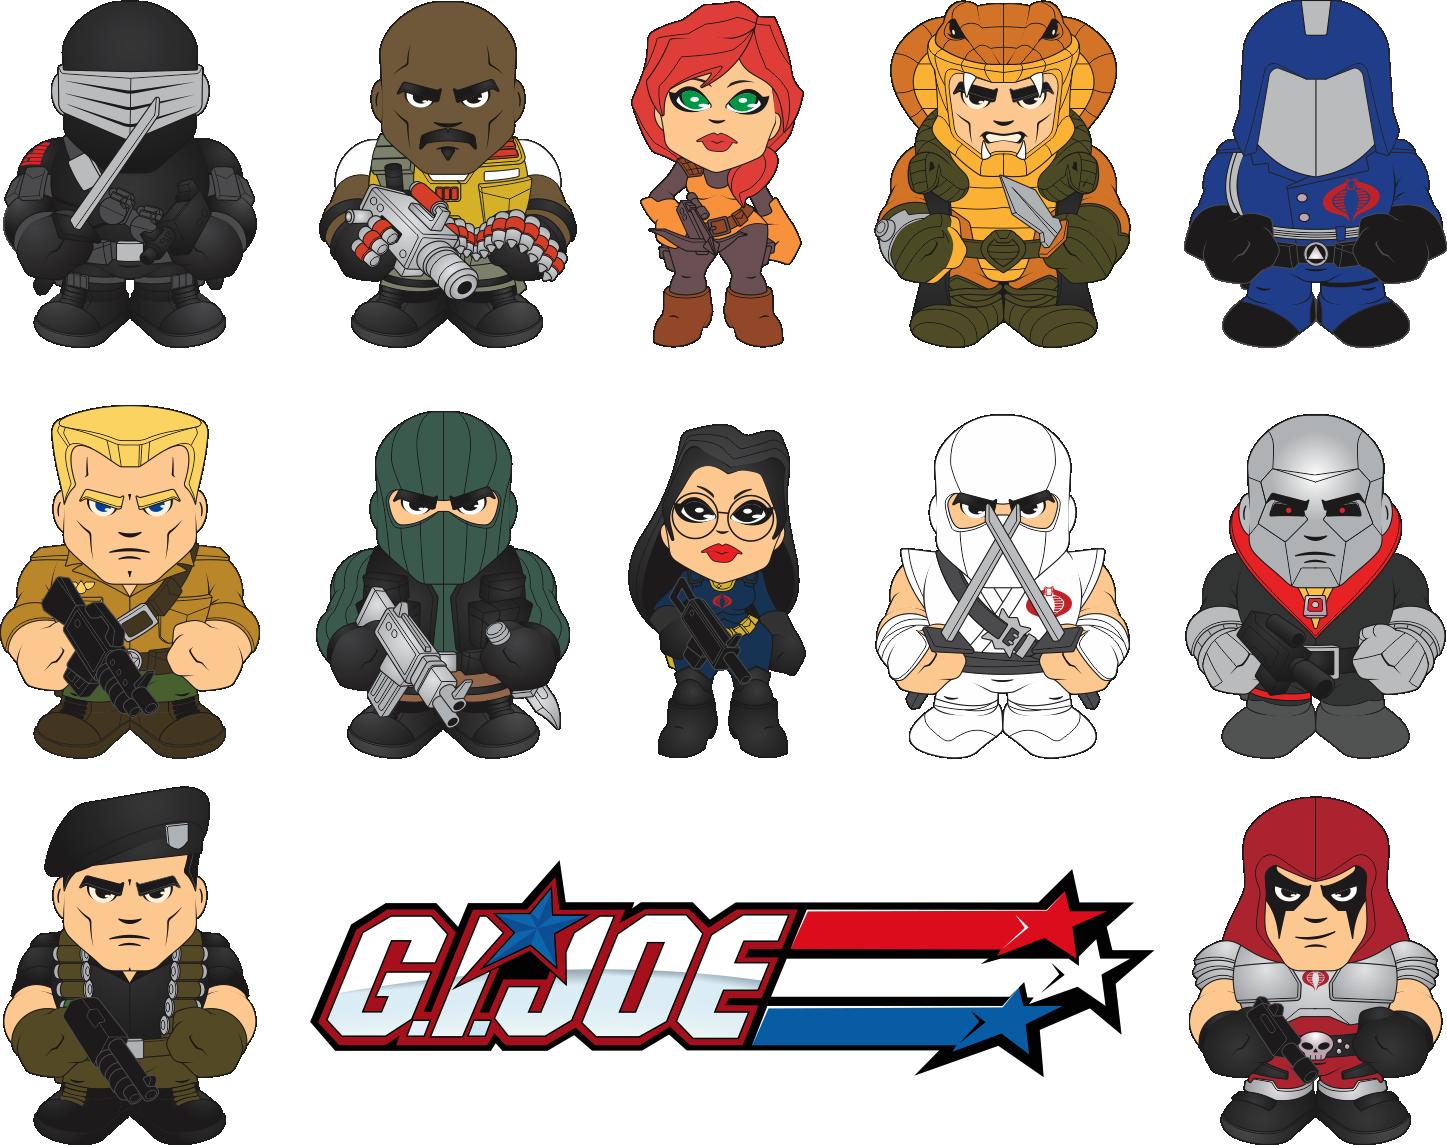 GI Joe Classic Mini Figure Design by BurningEyeStudios on DeviantArt